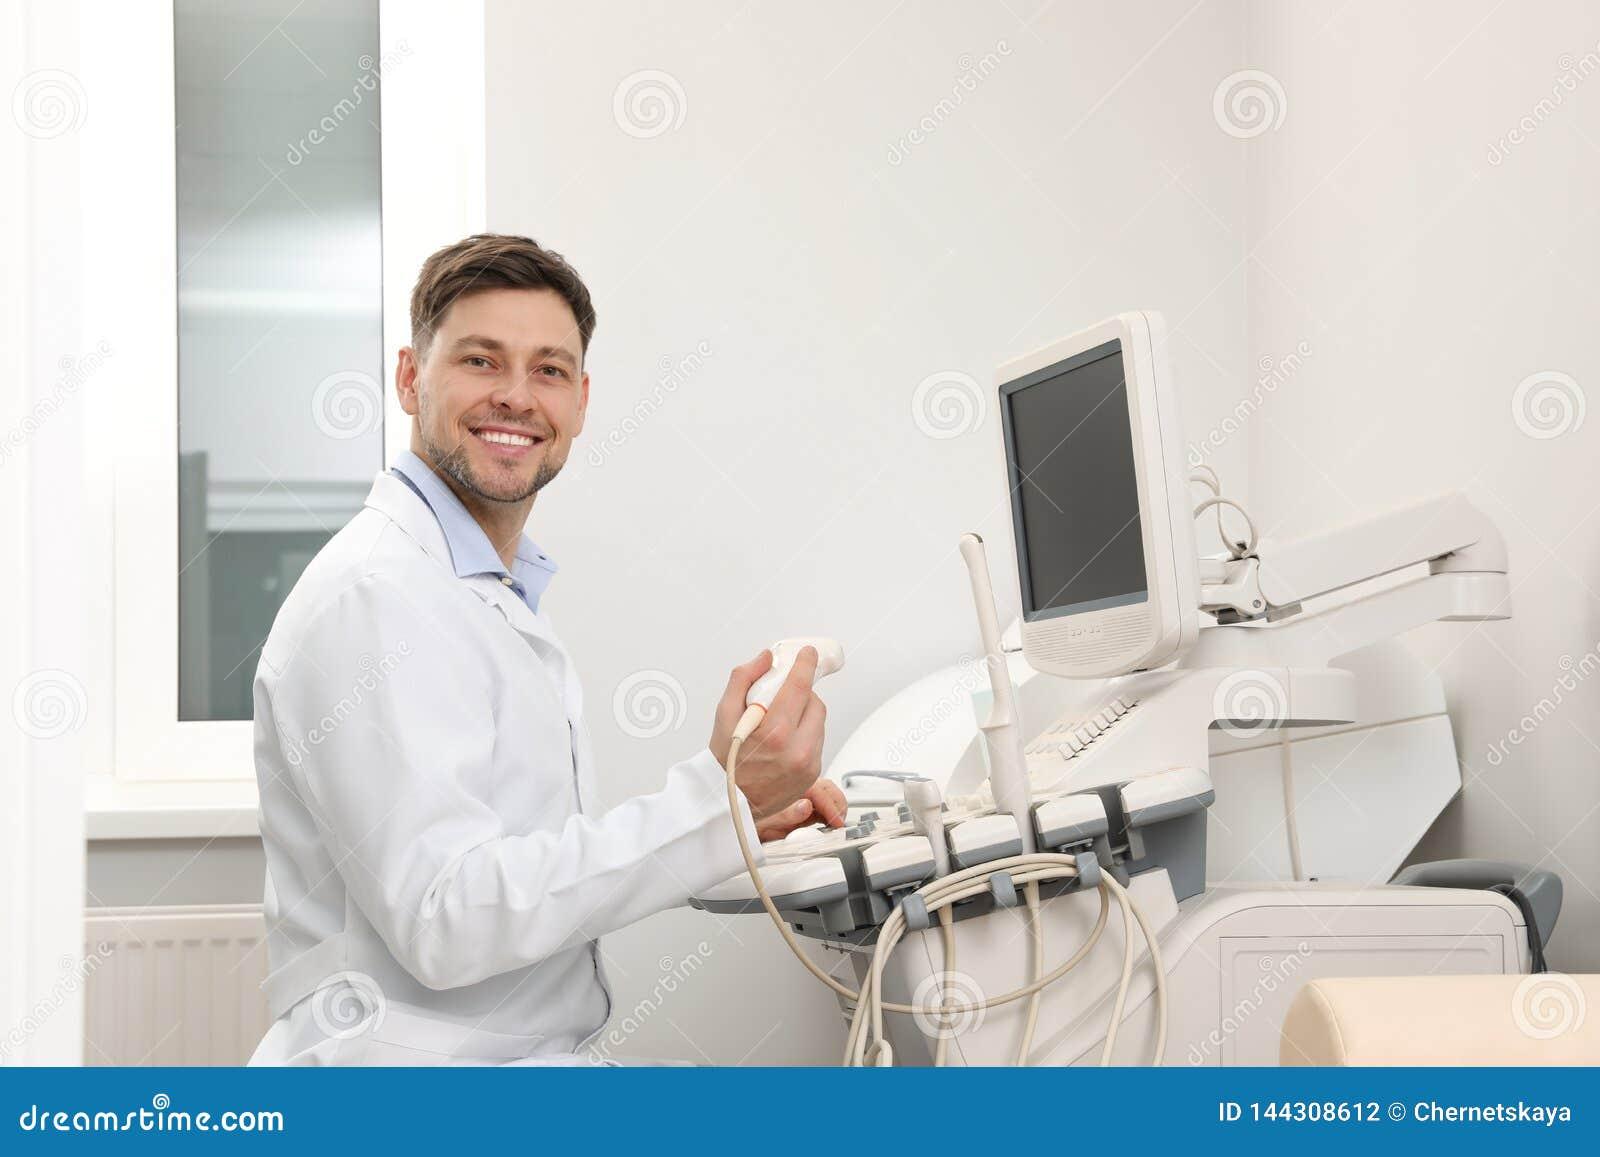 Sonographer operating modern ultrasound machine